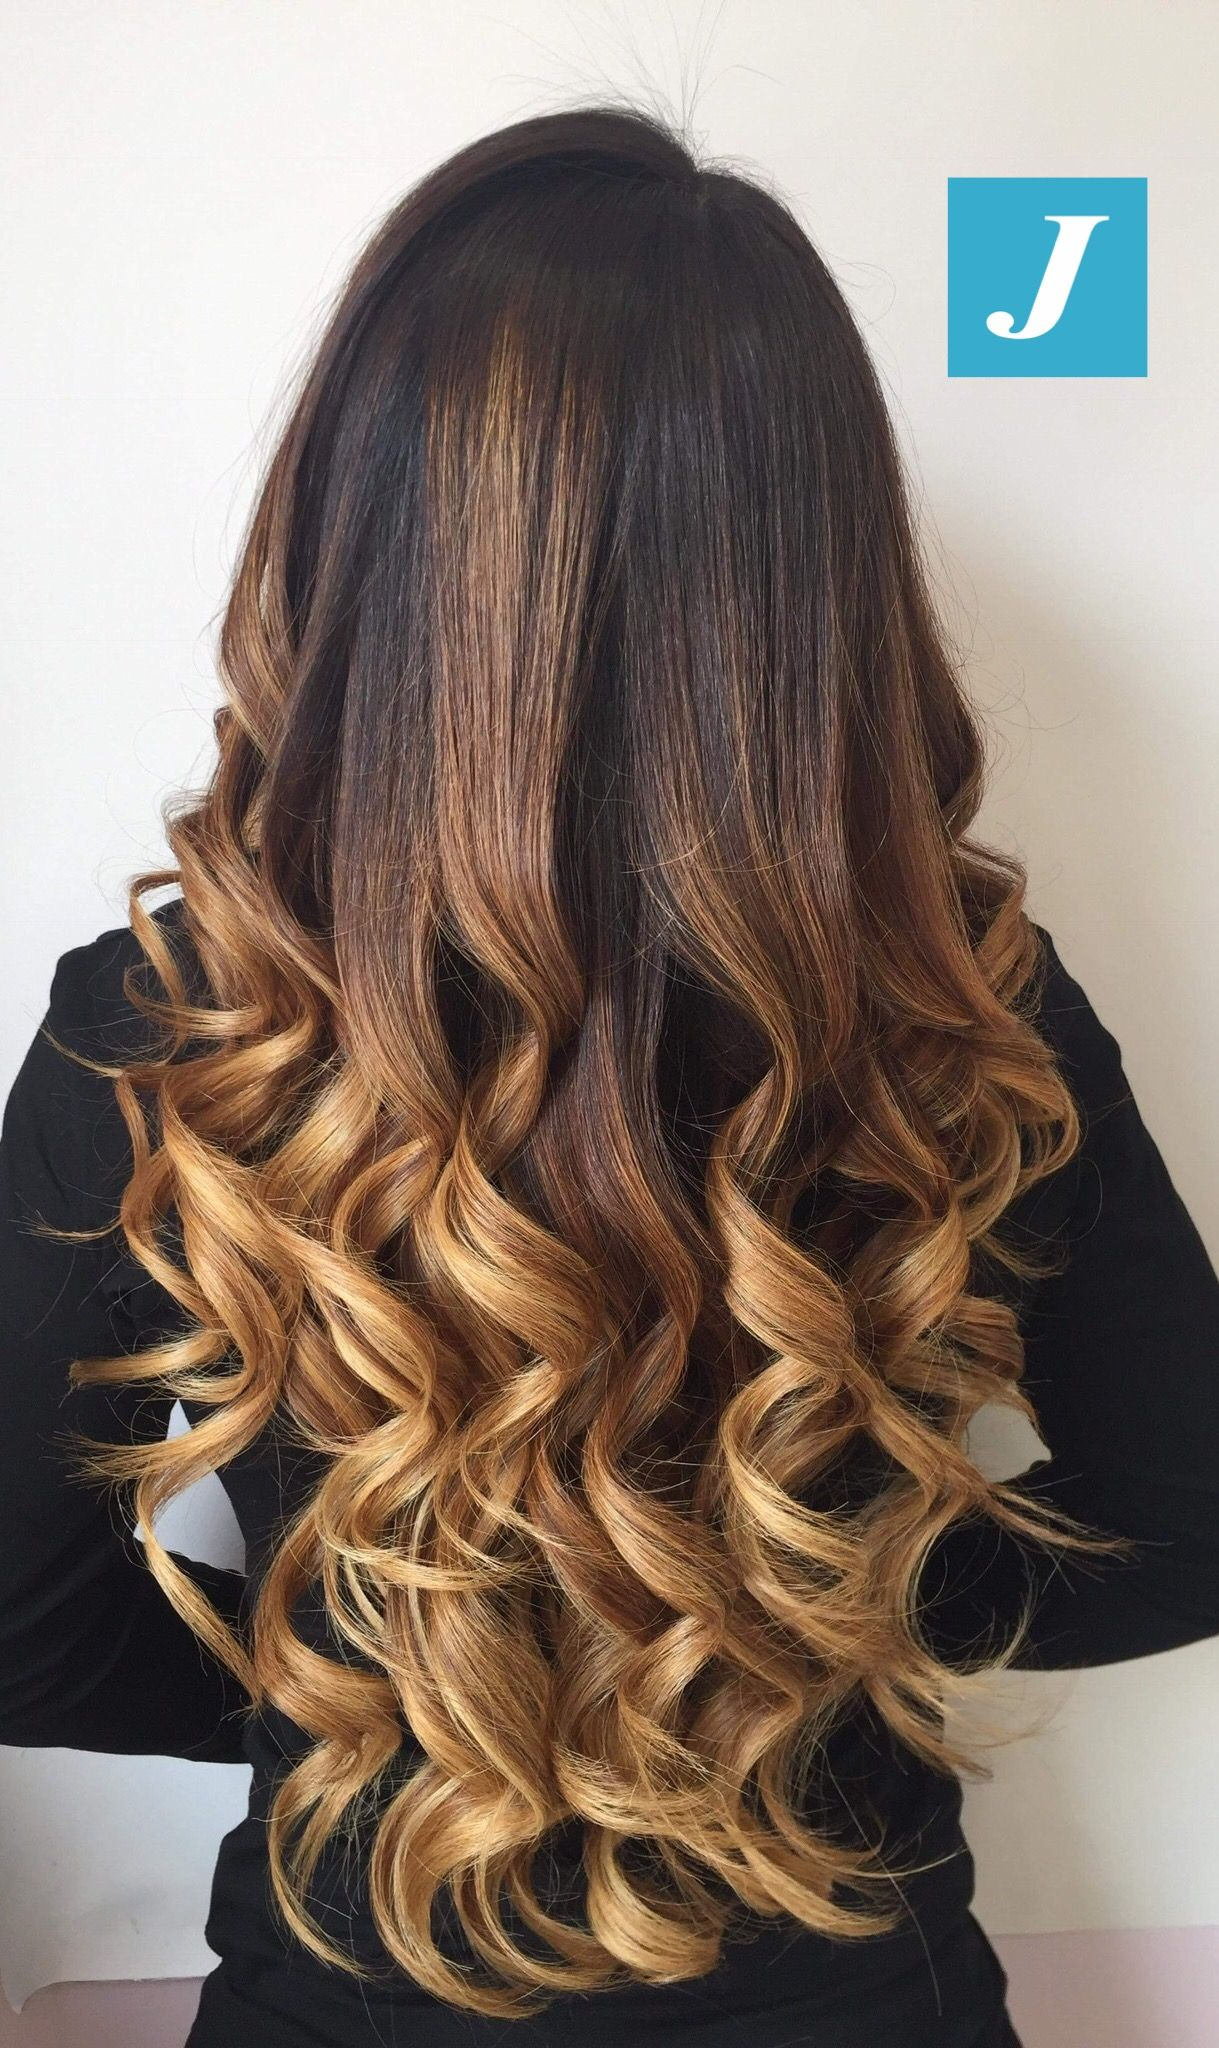 Inimitabile Degrade Joelle Cdj Degradejoelle Tagliopuntearia Degrade Igers Musthave Hair Hairstyle Curls For Long Hair Brown Hair Balayage Hair Styles